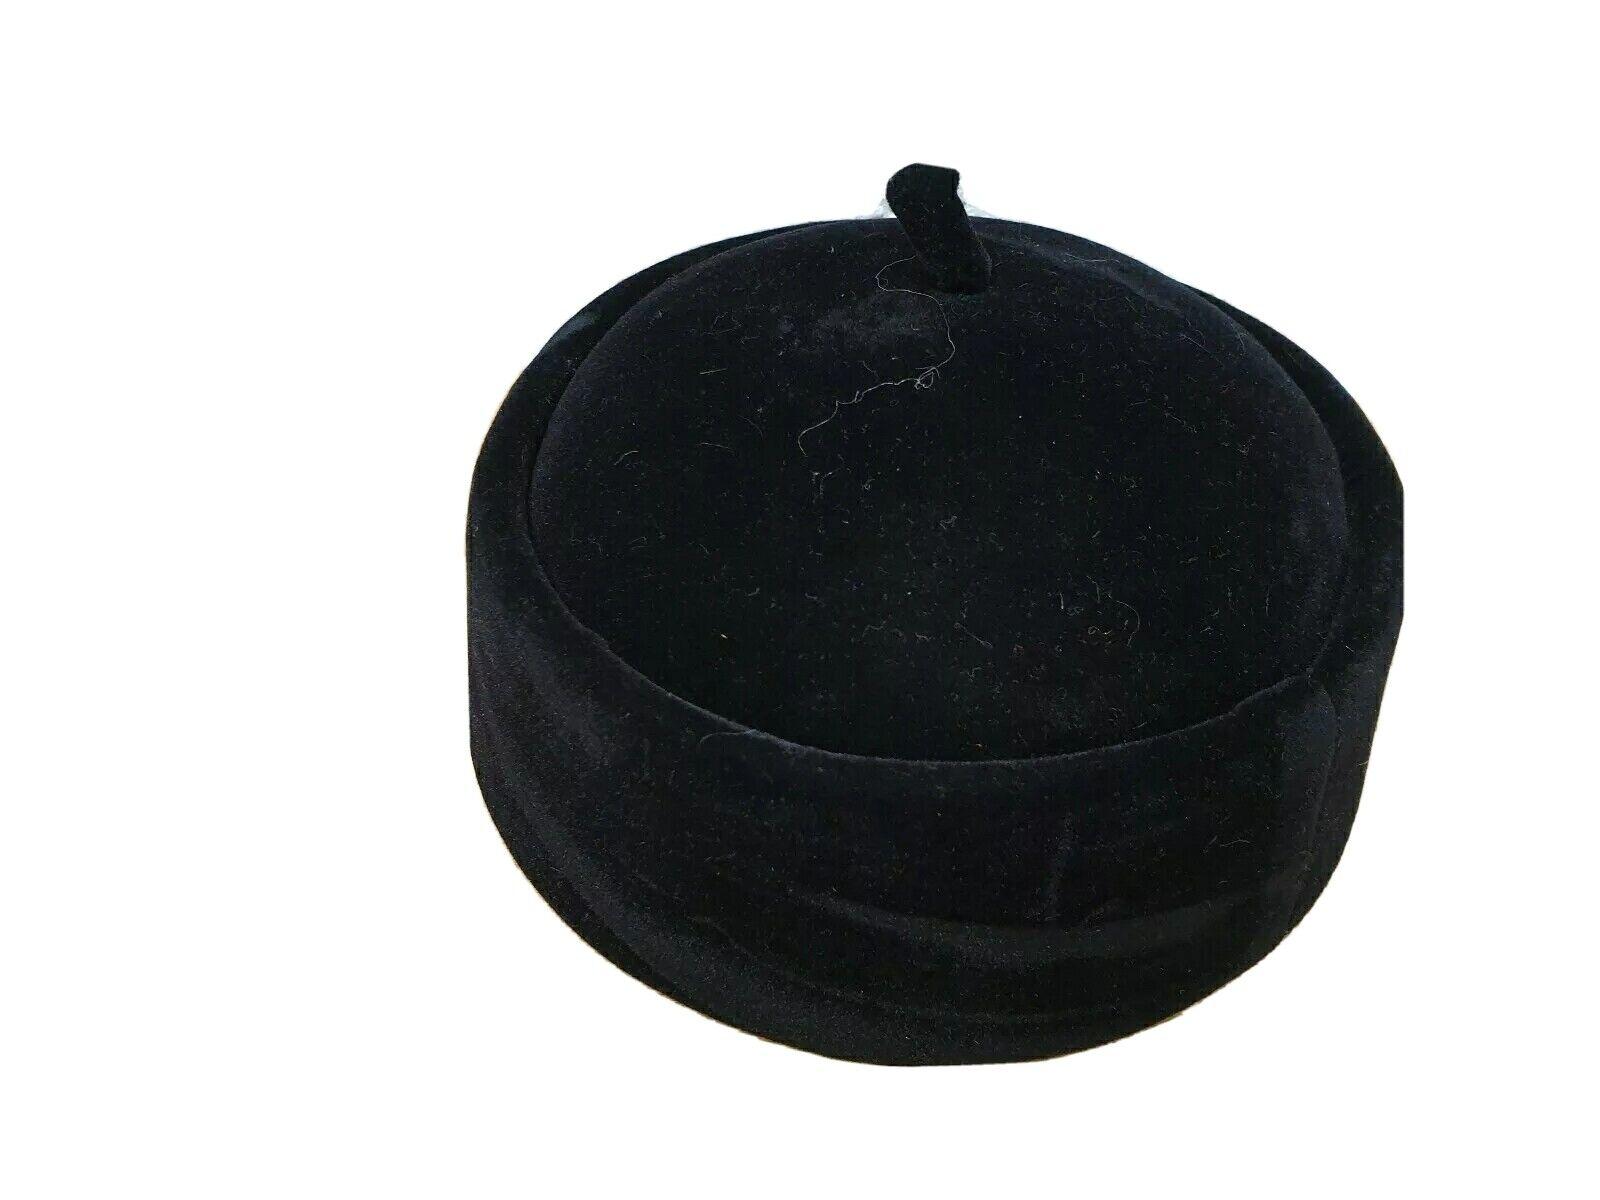 Elegant African Round Shaped Cap for Children